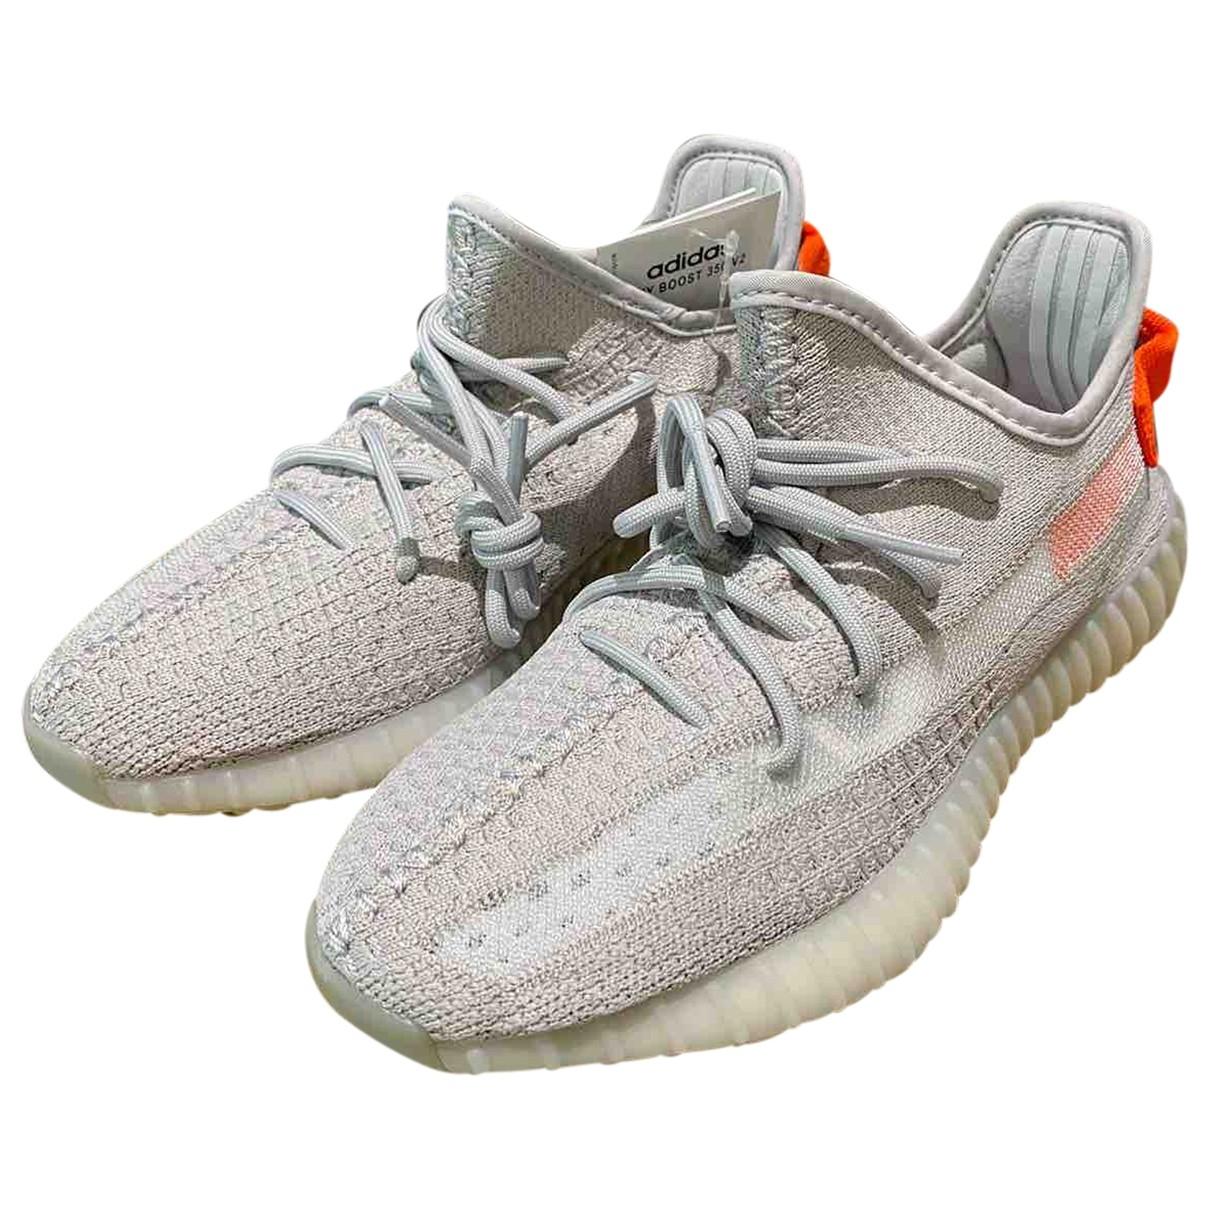 Yeezy X Adidas - Baskets Boost 350 V2 pour femme - orange